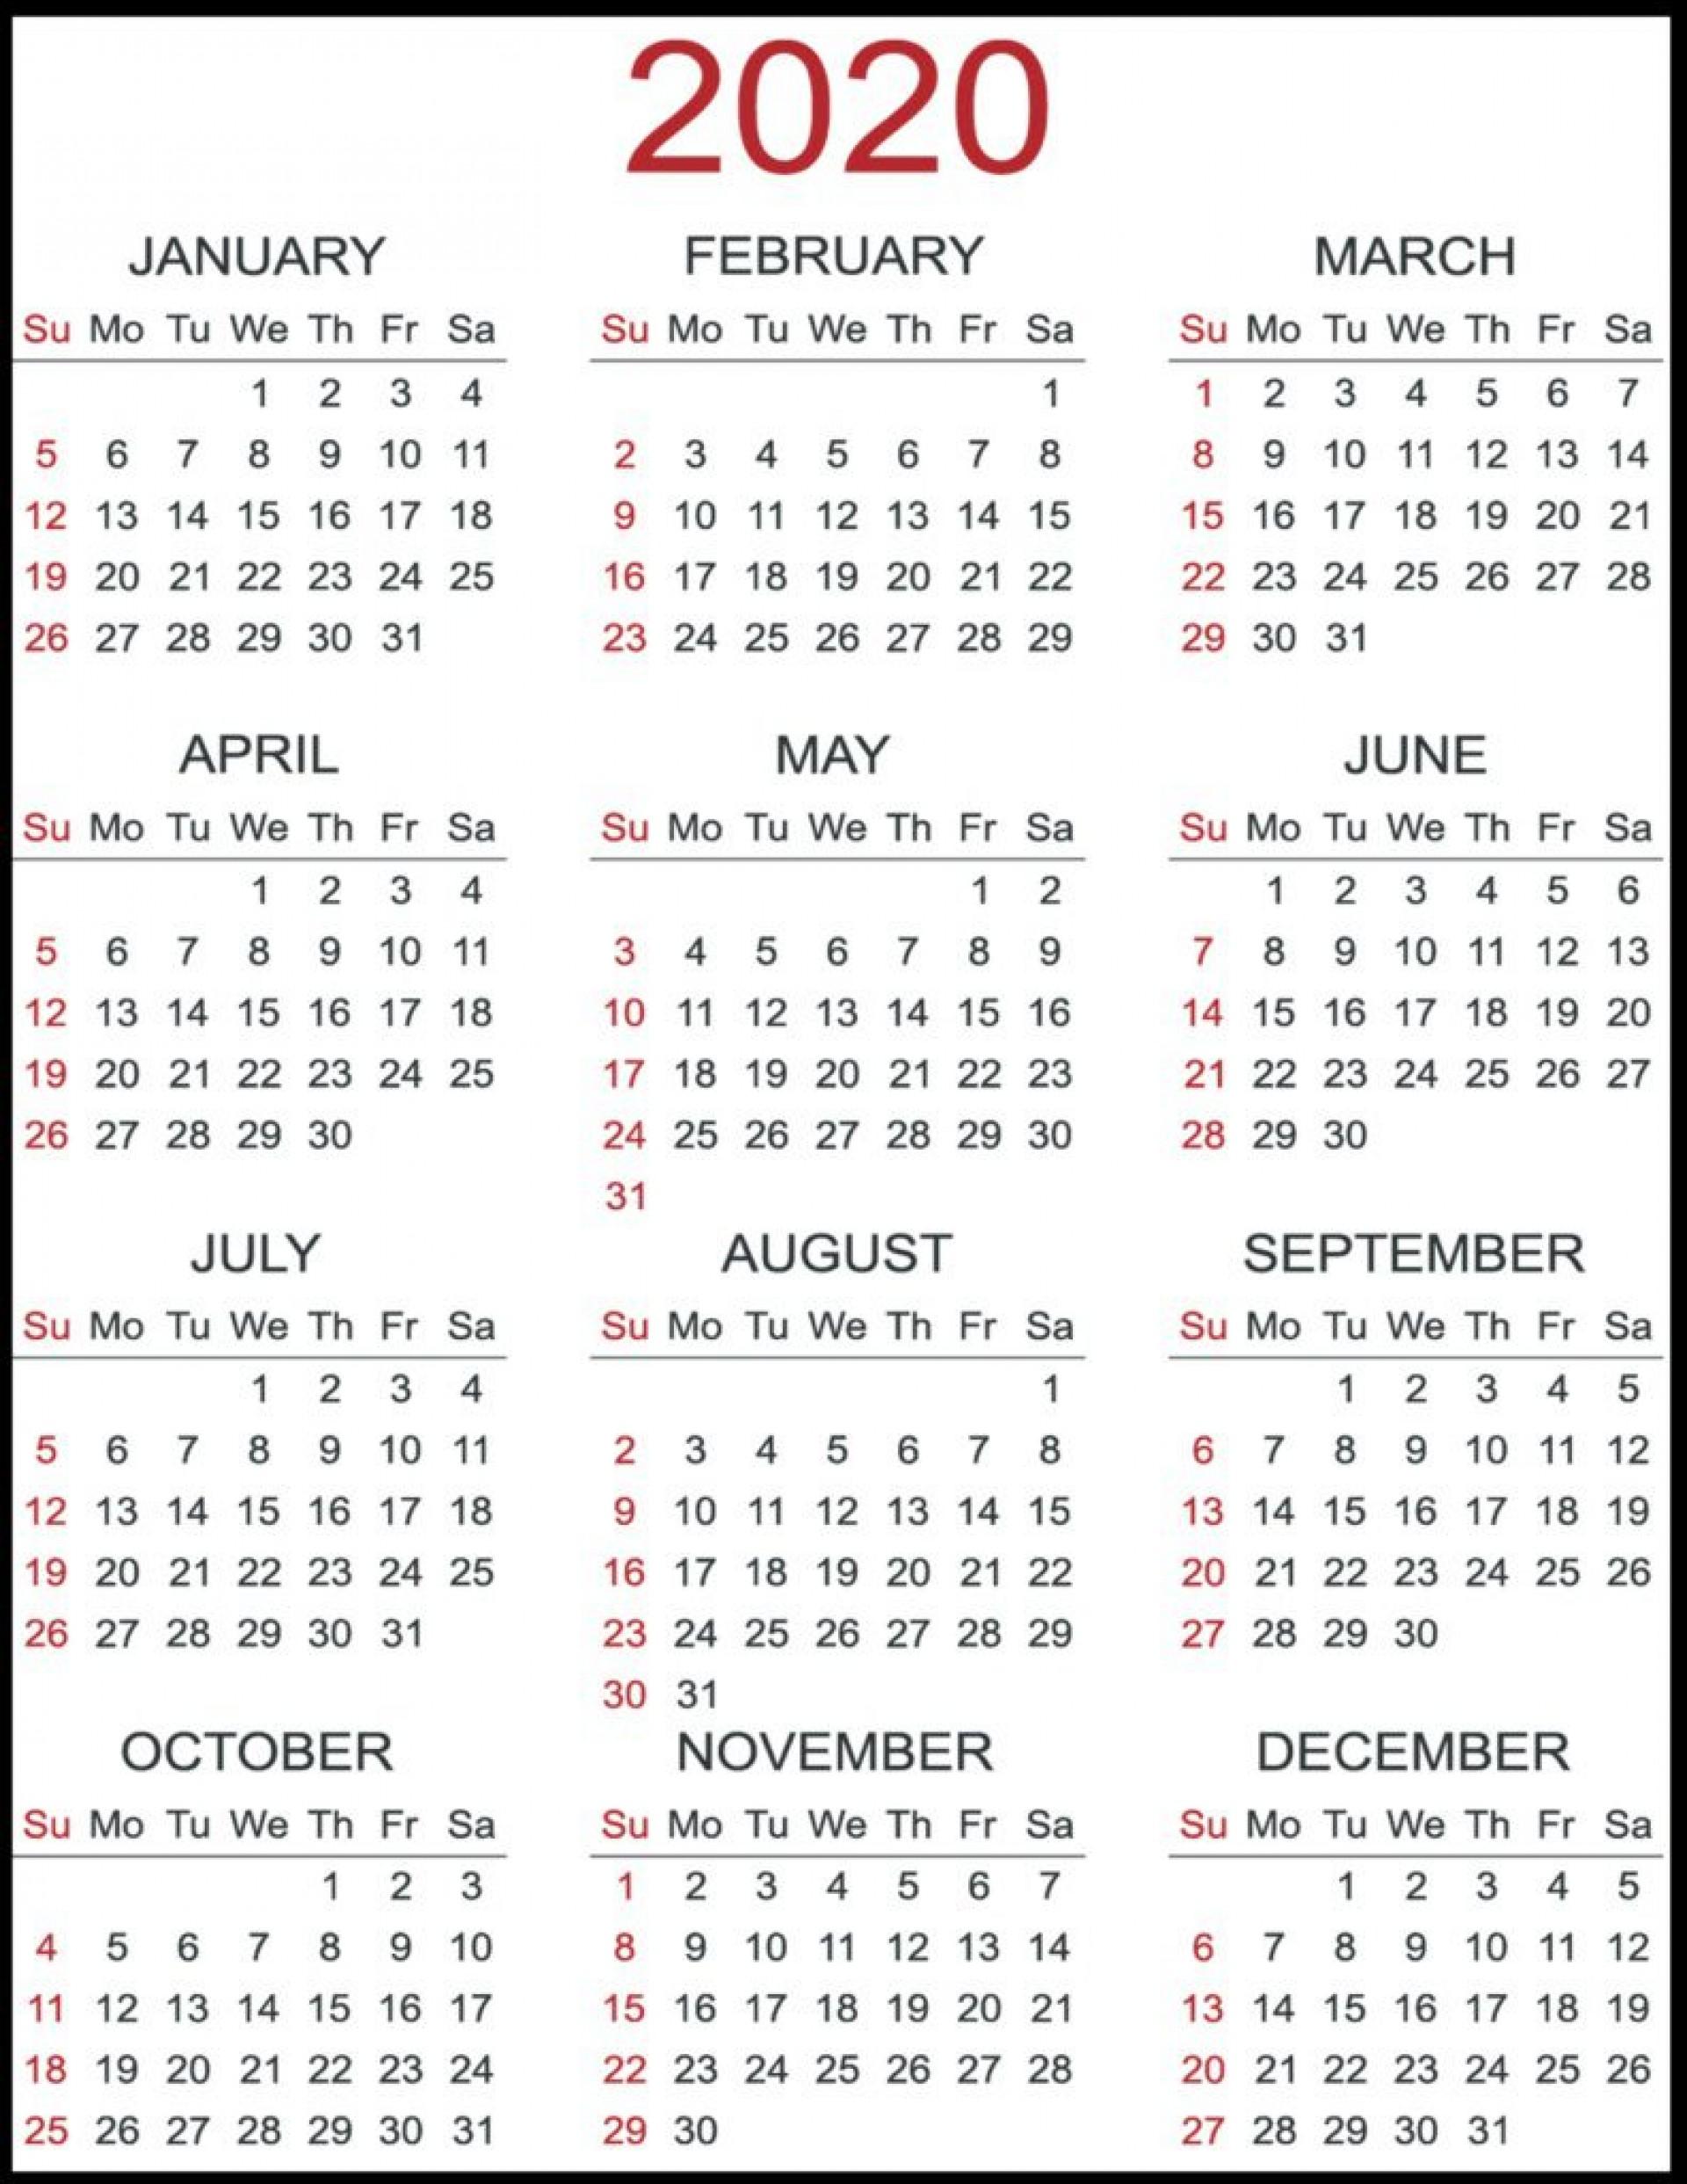 007 Phenomenal 2020 Payroll Calendar Template High Resolution  Biweekly Canada Free Excel1920